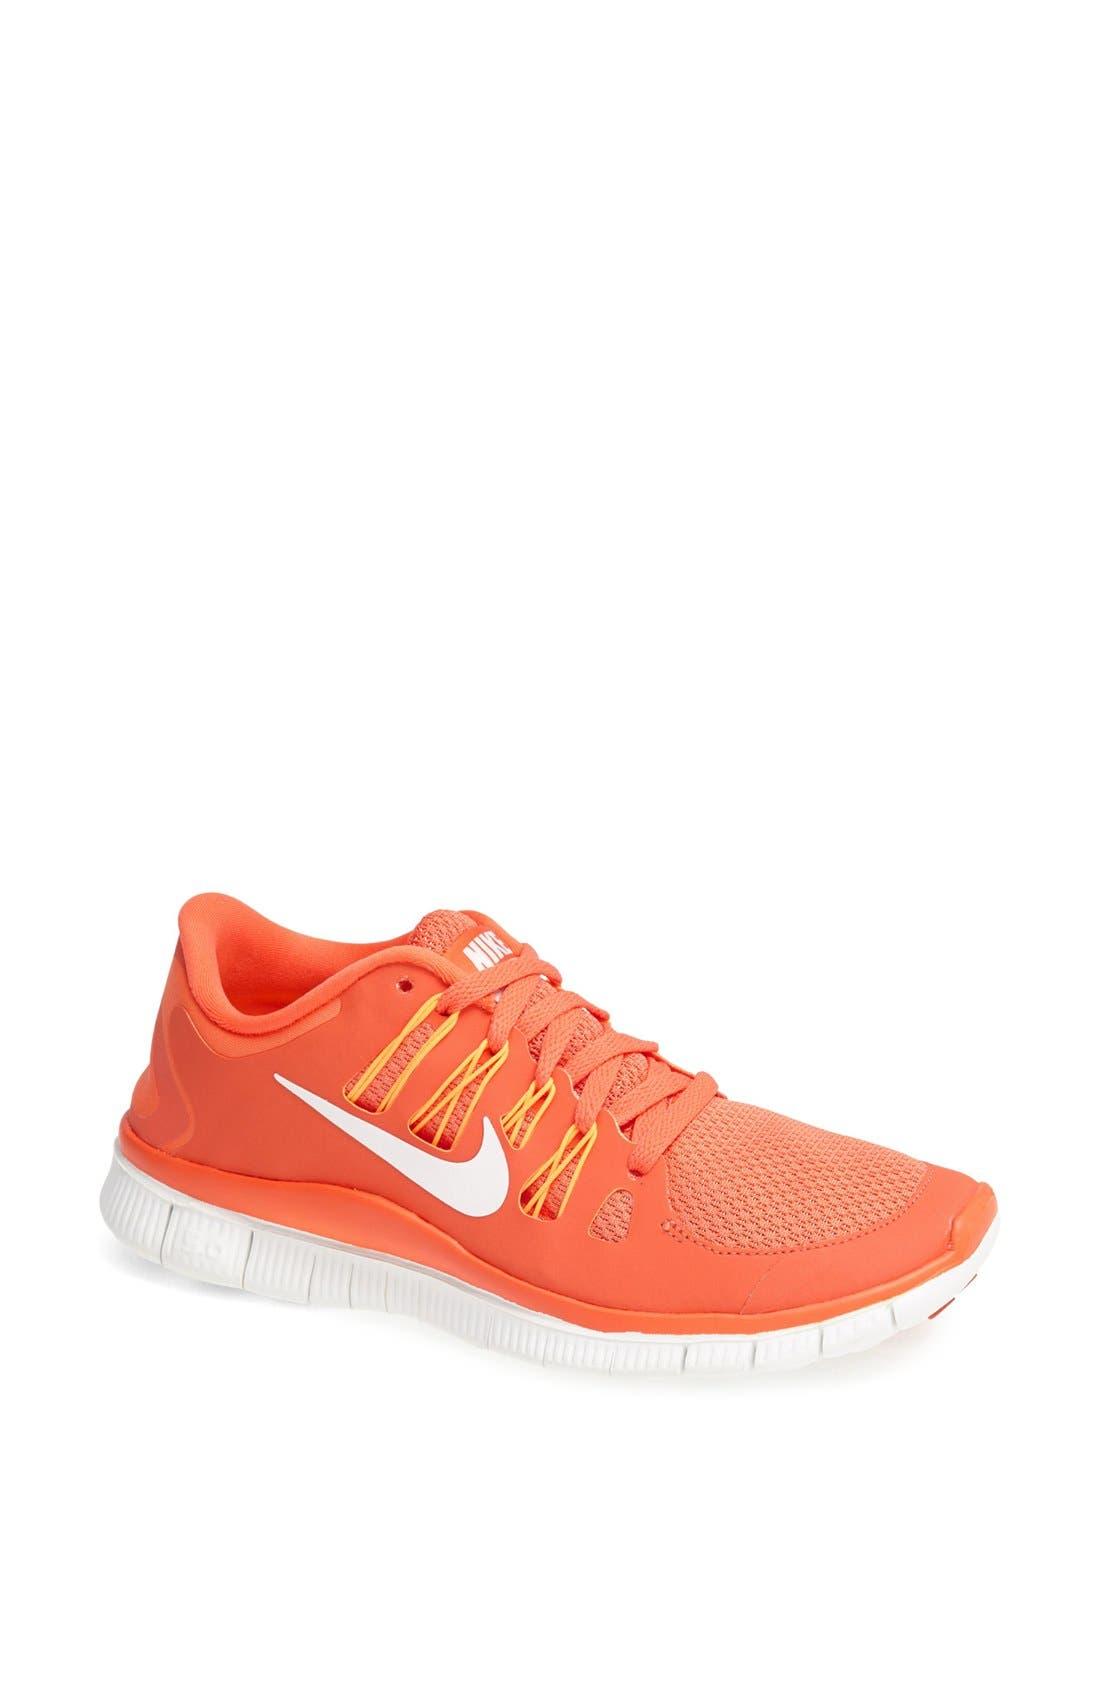 Nike Free 5.0 Femmes Nordstrom